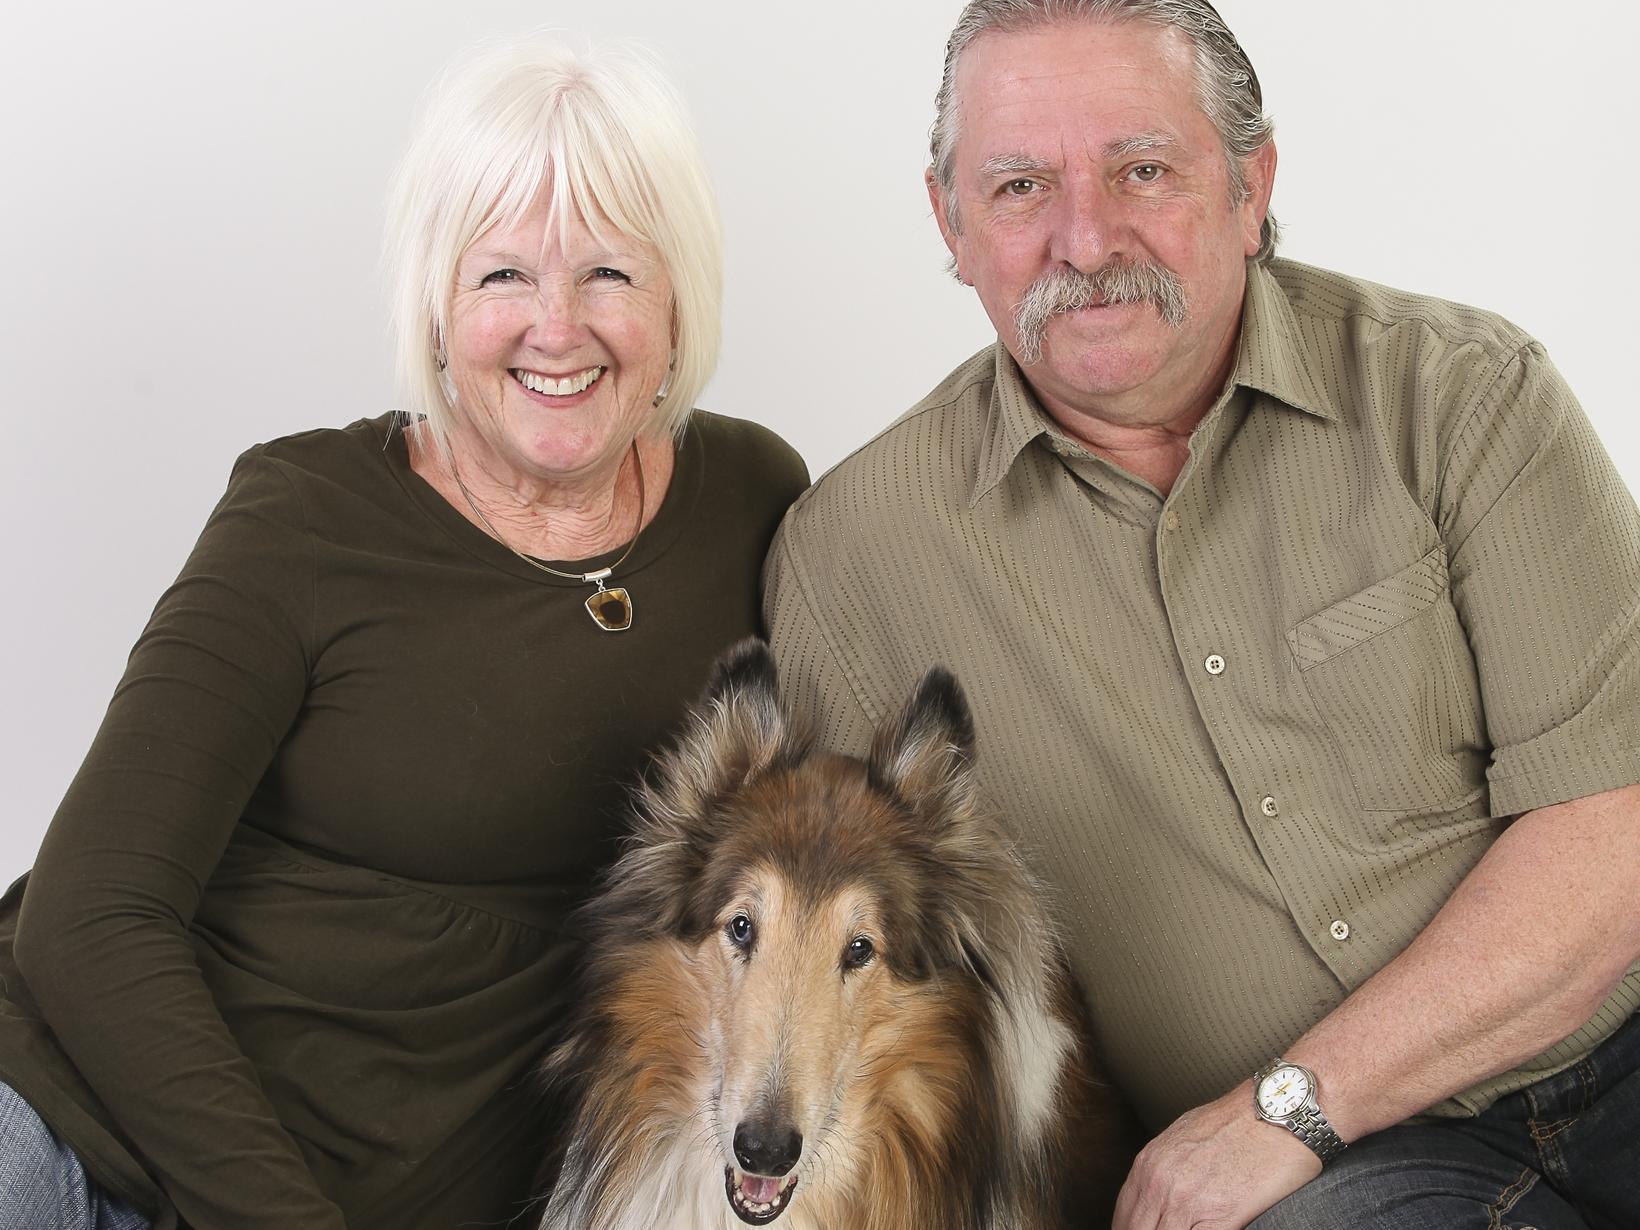 Greg & Debbie from Edmonton, Alberta, Canada